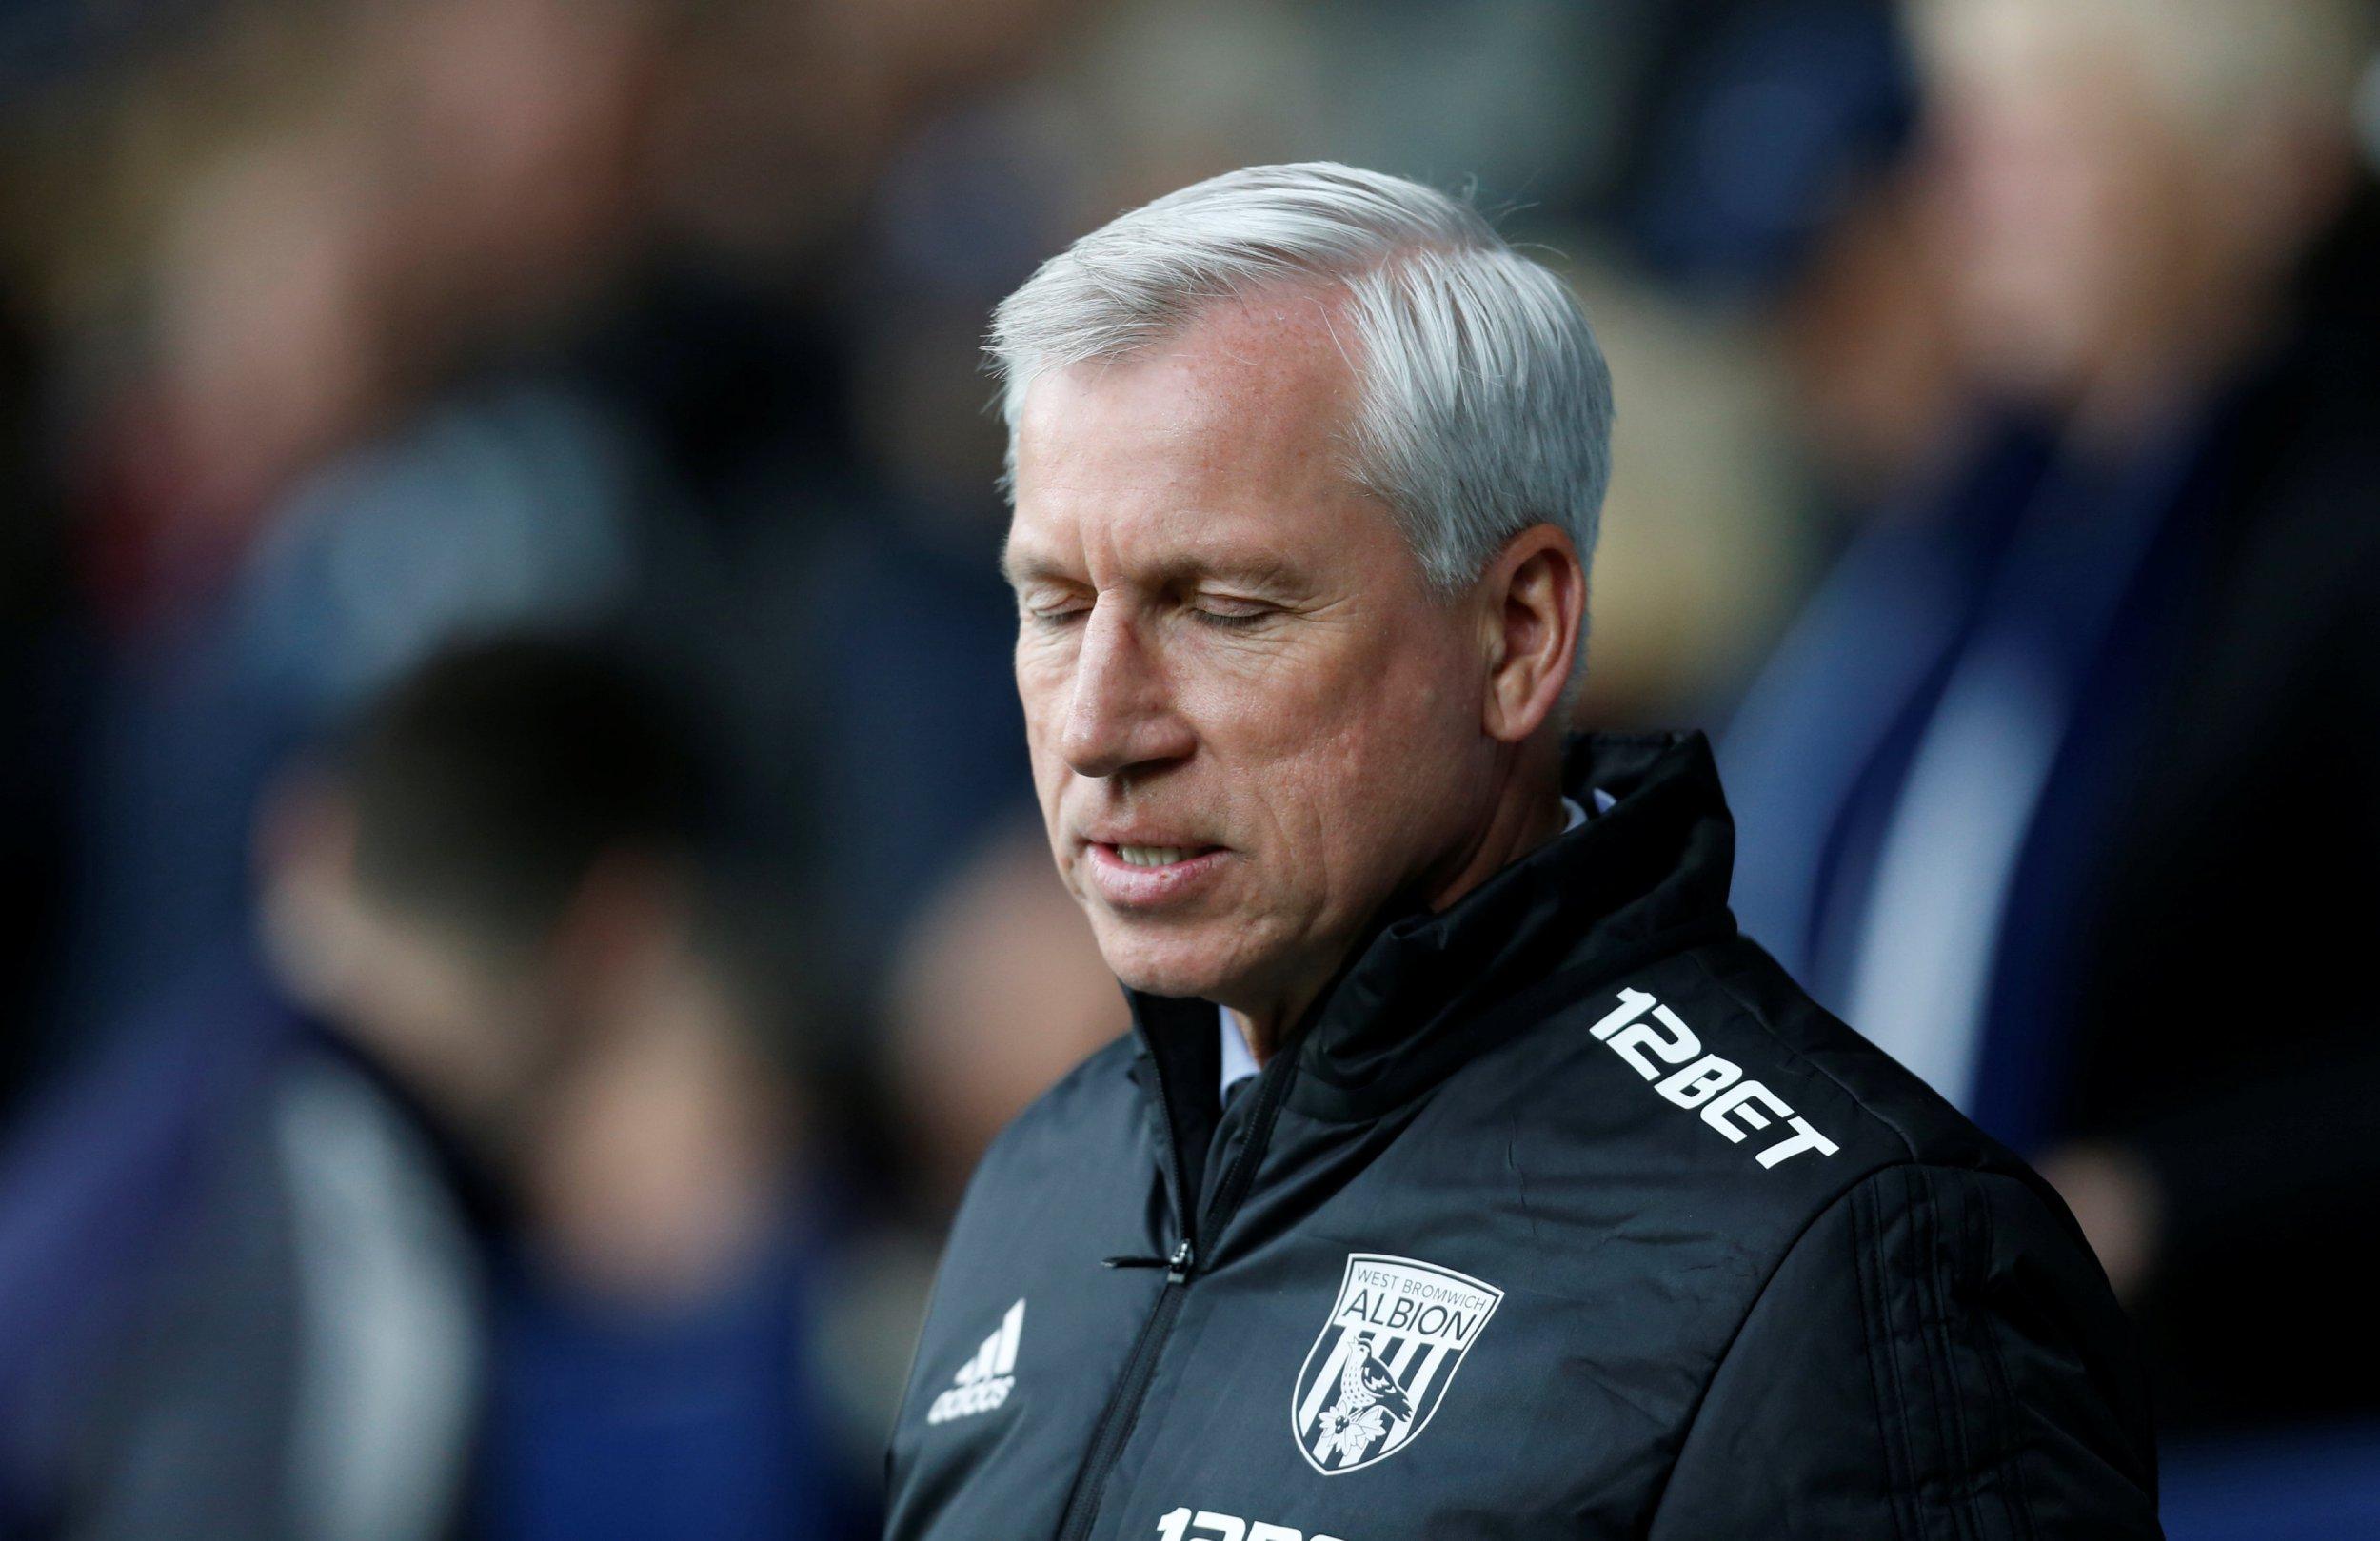 West Brom sack Alan Pardew with Baggies facing Premier League relegation